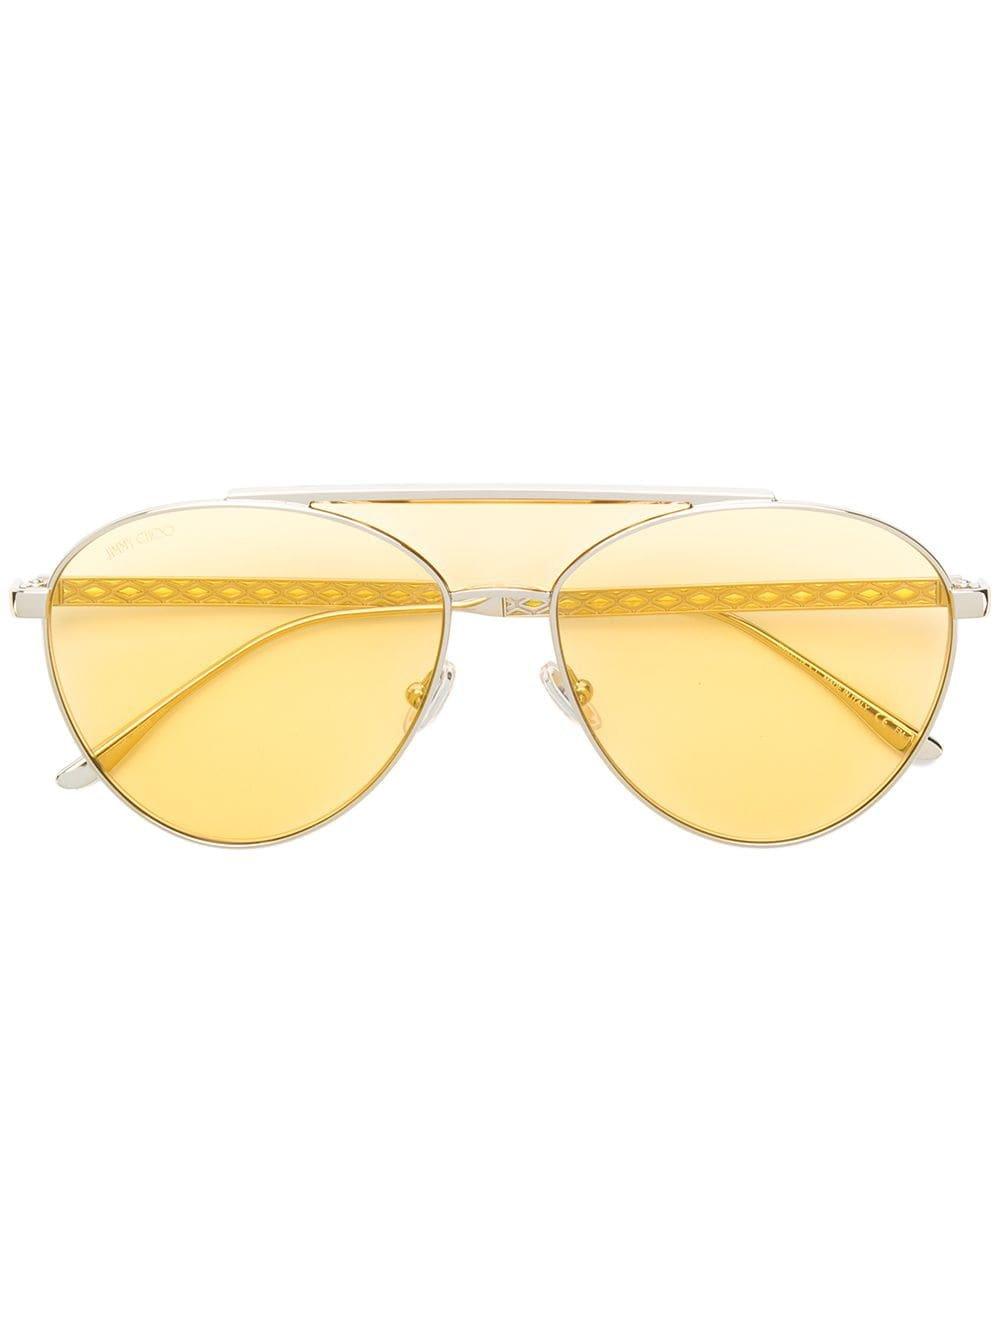 Jimmy Choo Eyewear Ave Sunglasses